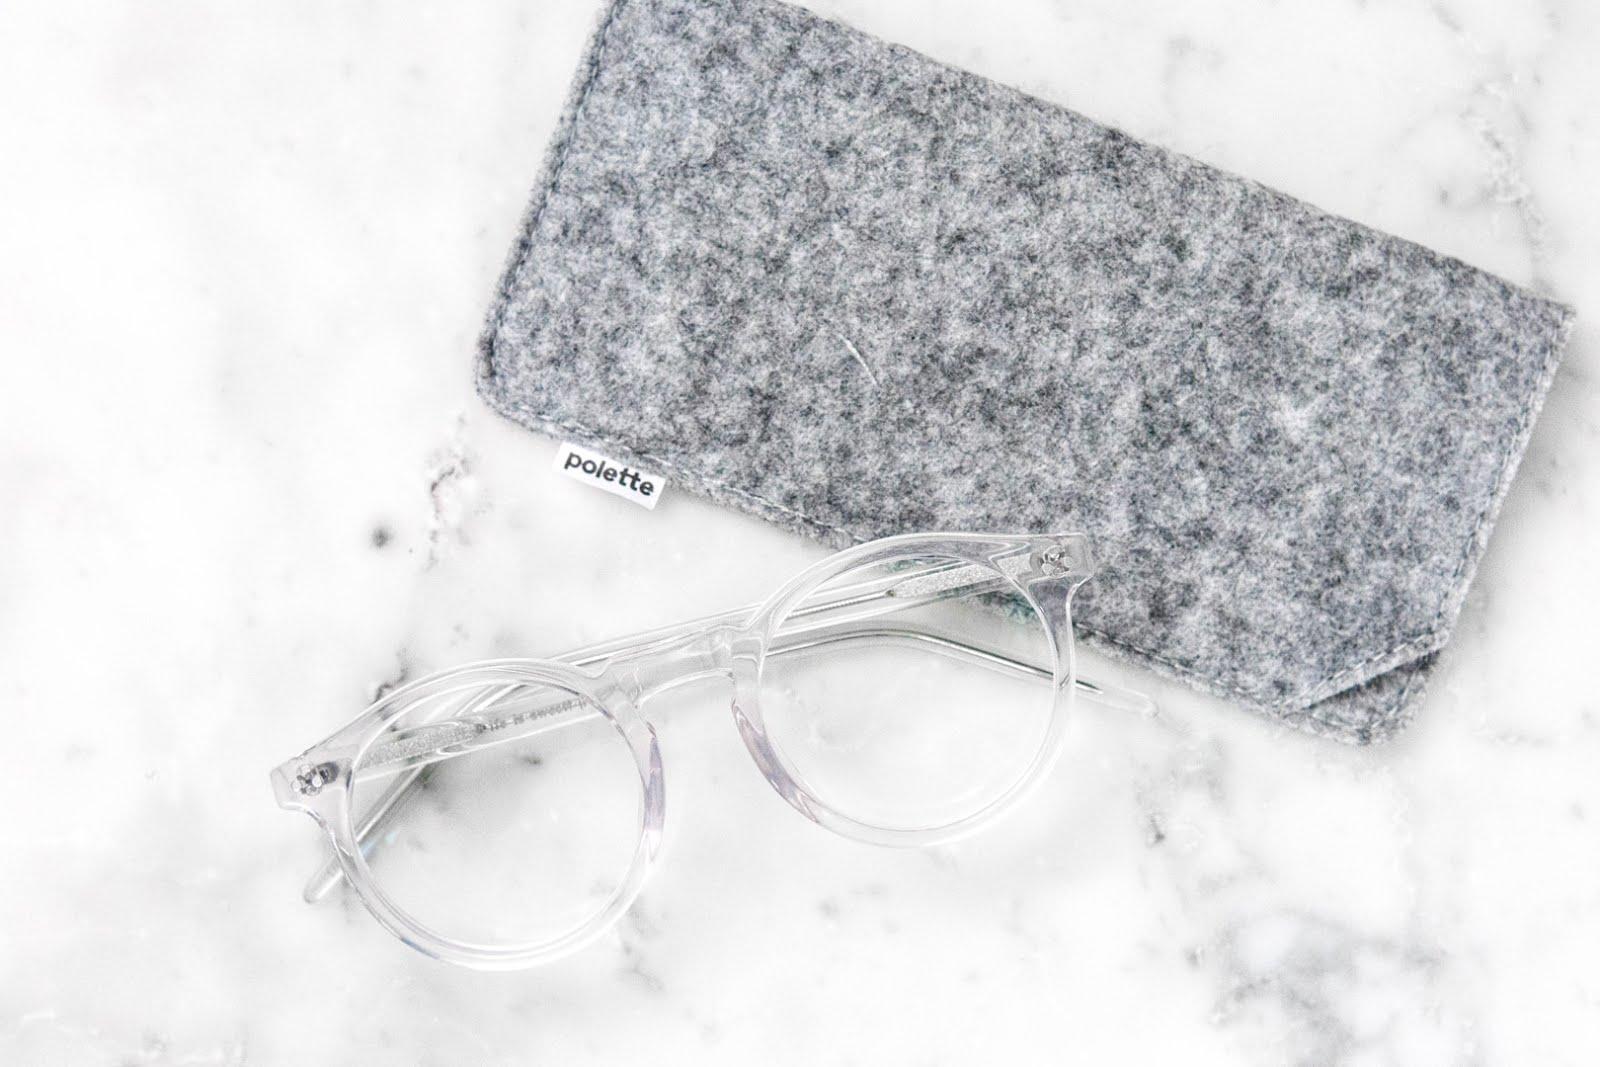 Polette, delice trans, transparent glasses, doorzichtig, bril, goedkoop, minimal,